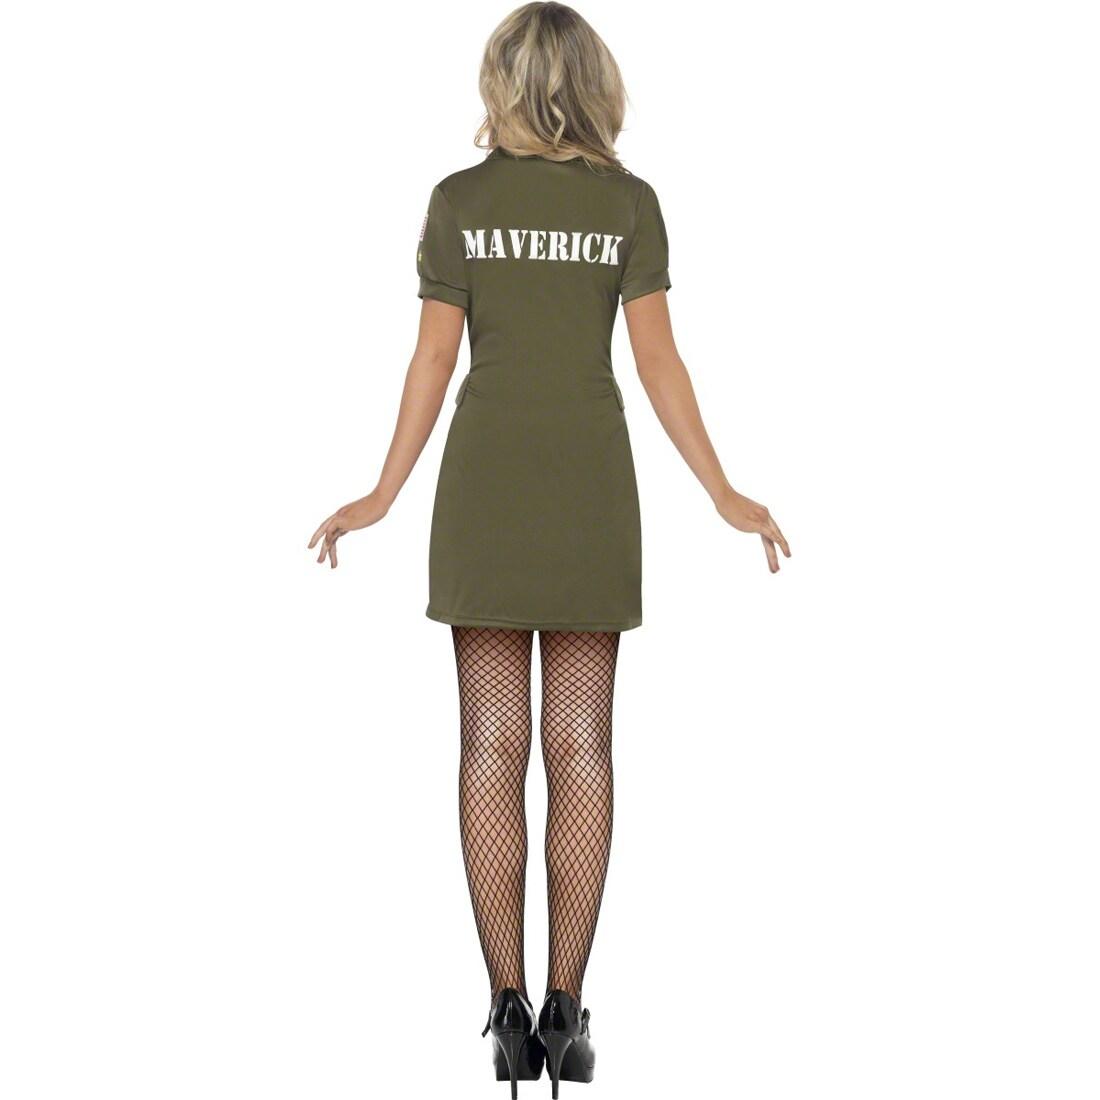 top gun pilotin kost m army girl uniform gr n l 44 46. Black Bedroom Furniture Sets. Home Design Ideas